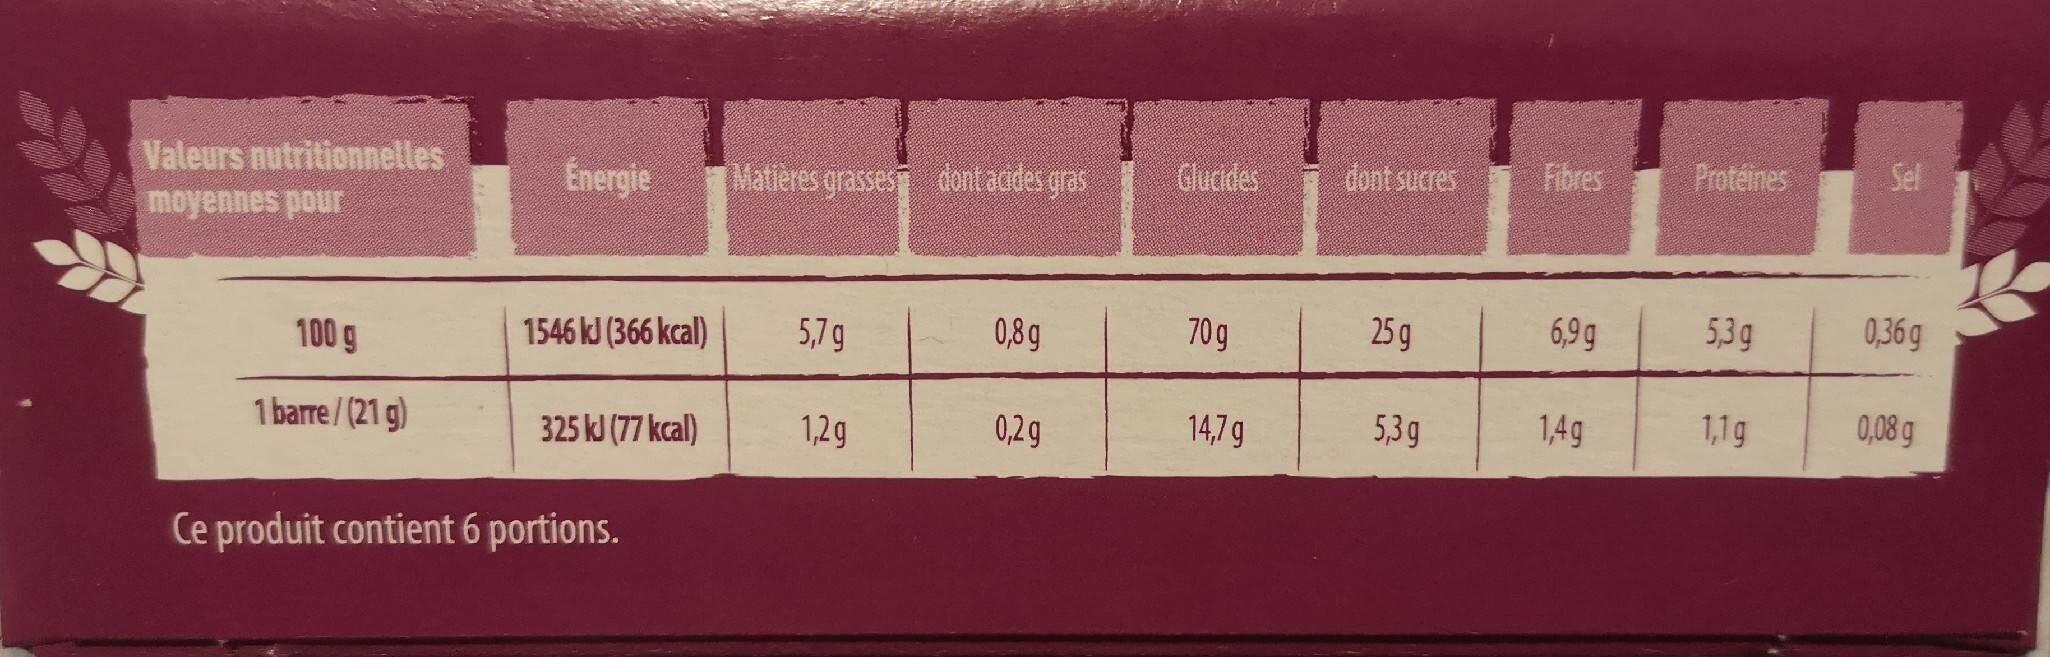 Barre cereales figue - Informations nutritionnelles - fr